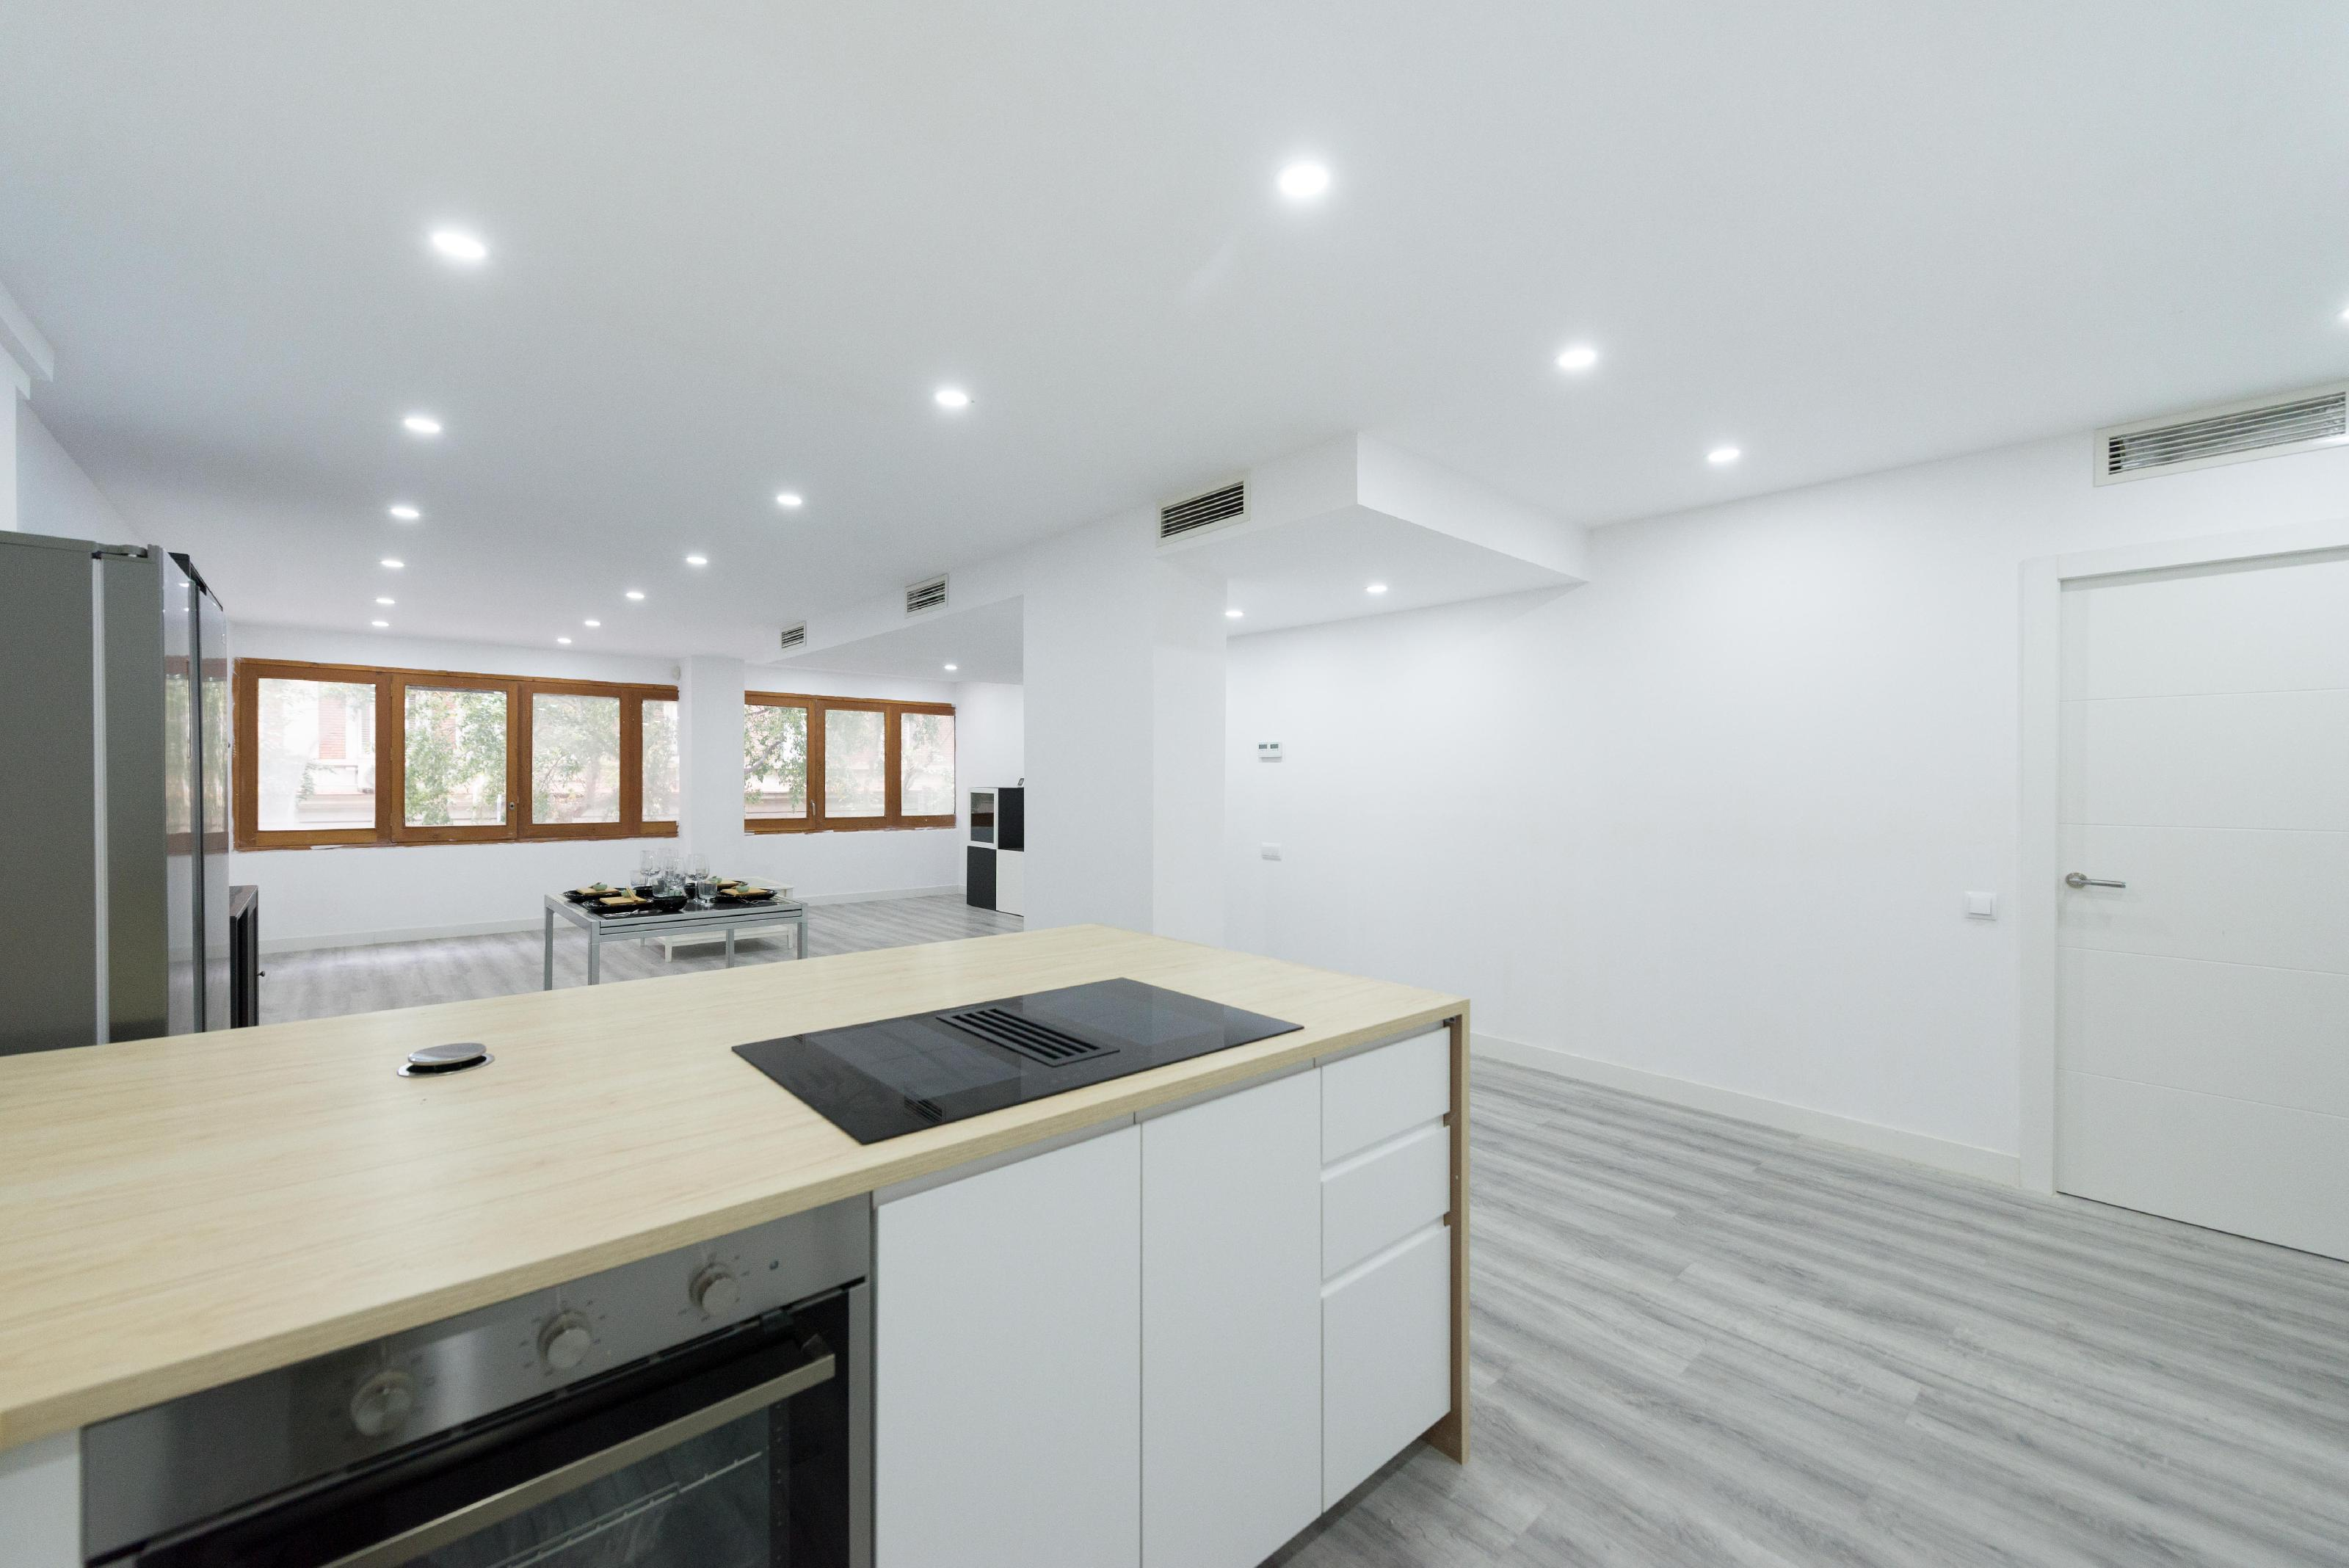 242980 Flat for sale in Eixample, Sagrada Familia 6